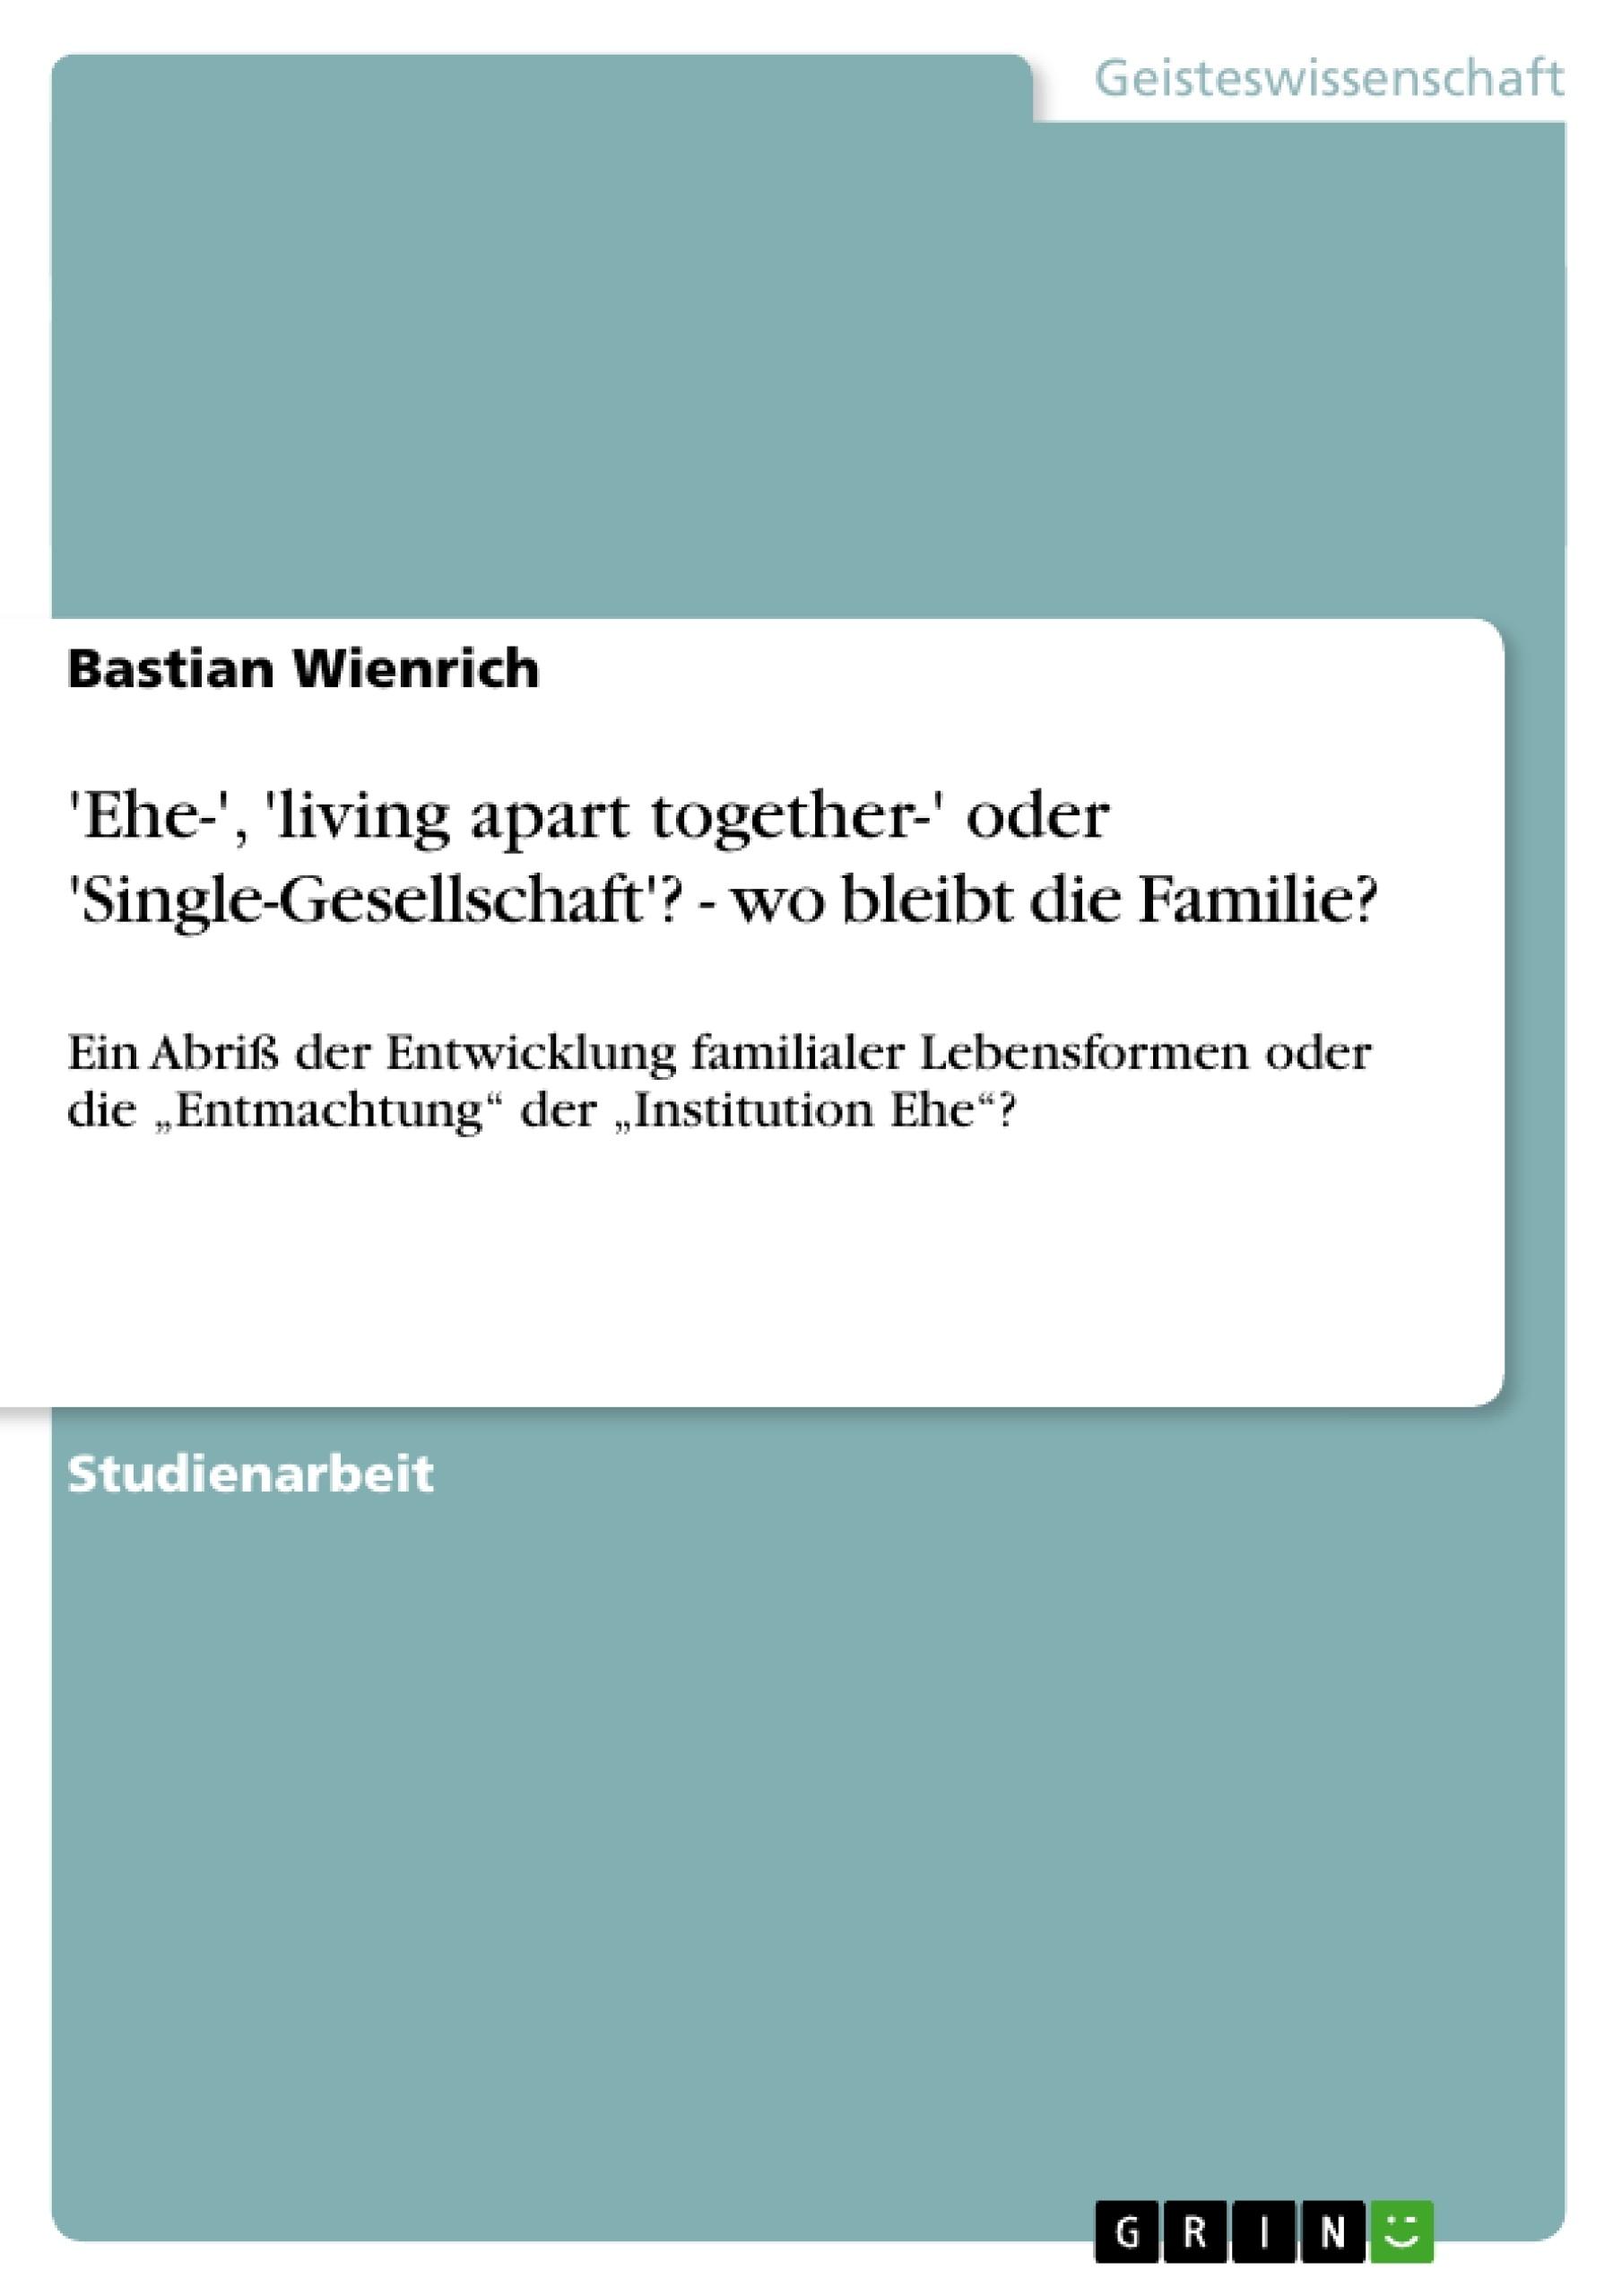 Titel: 'Ehe-', 'living apart together-' oder 'Single-Gesellschaft'?  - wo bleibt die Familie?